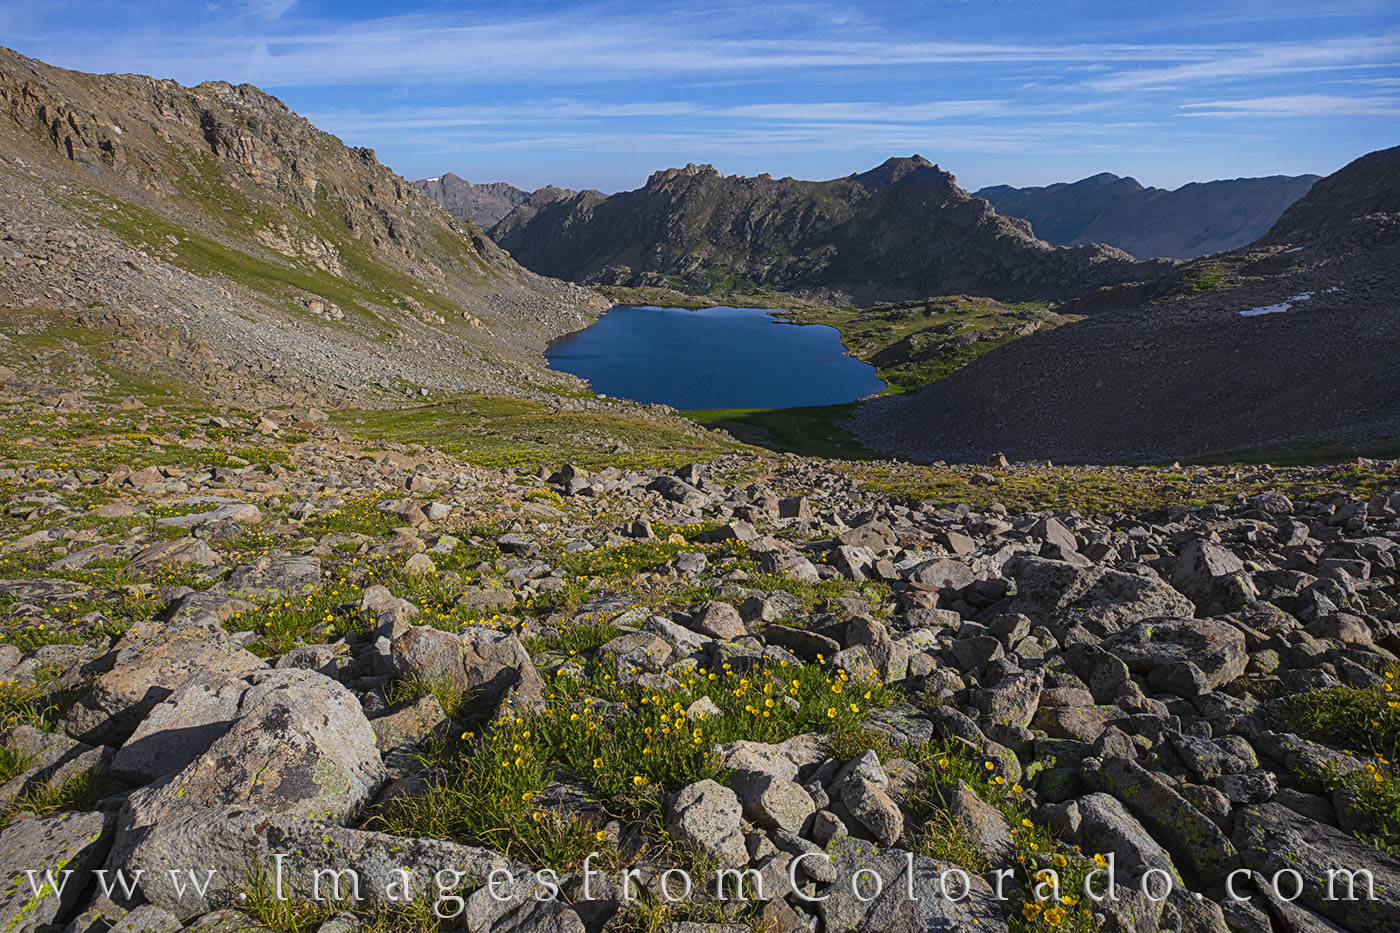 lost man lake, lost man pass, independence lake, independence pass, aspen, alpine lake, blue, summer, hiking, colorado hikes, photo